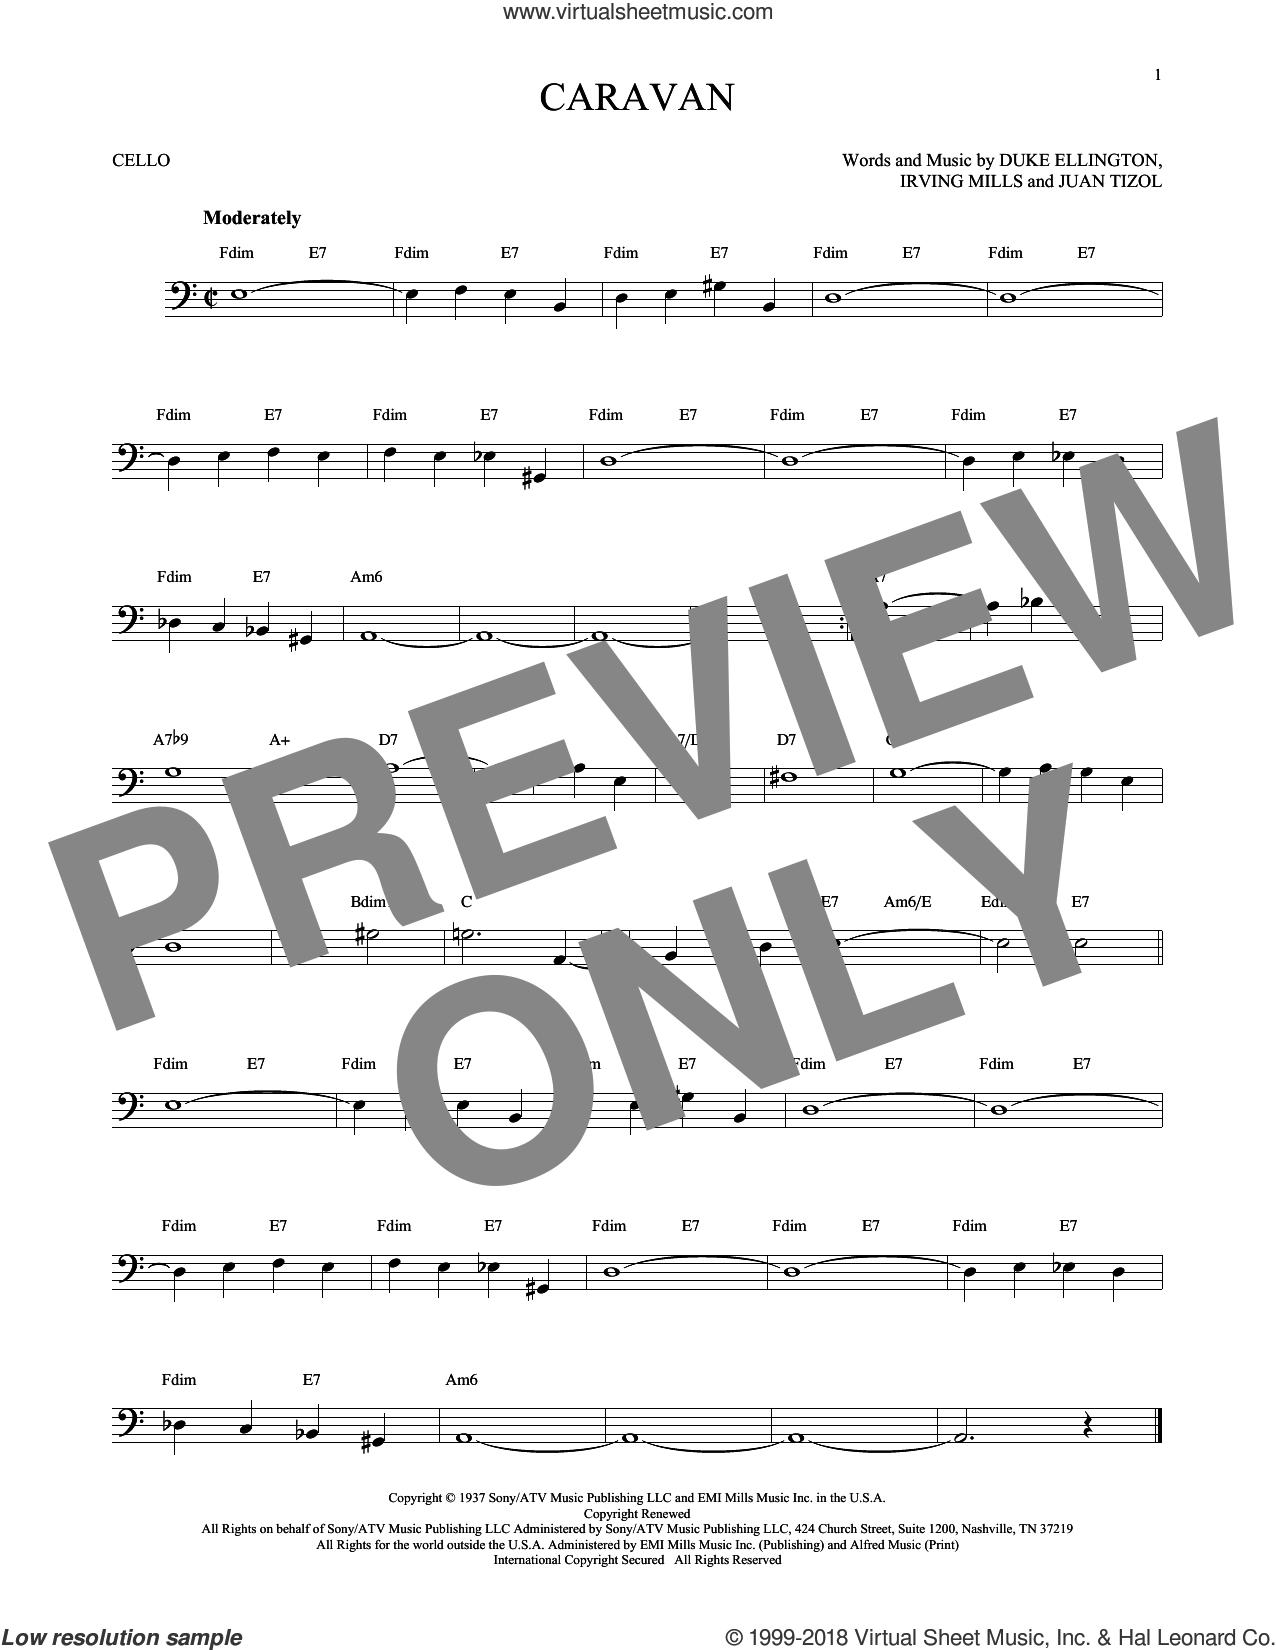 Caravan sheet music for cello solo by Duke Ellington, Billy Eckstine, Duke Ellington and his Orchestra, Ralph Marterie, Irving Mills, Juan Tizol and Juan Tizol & Duke Ellington, intermediate skill level